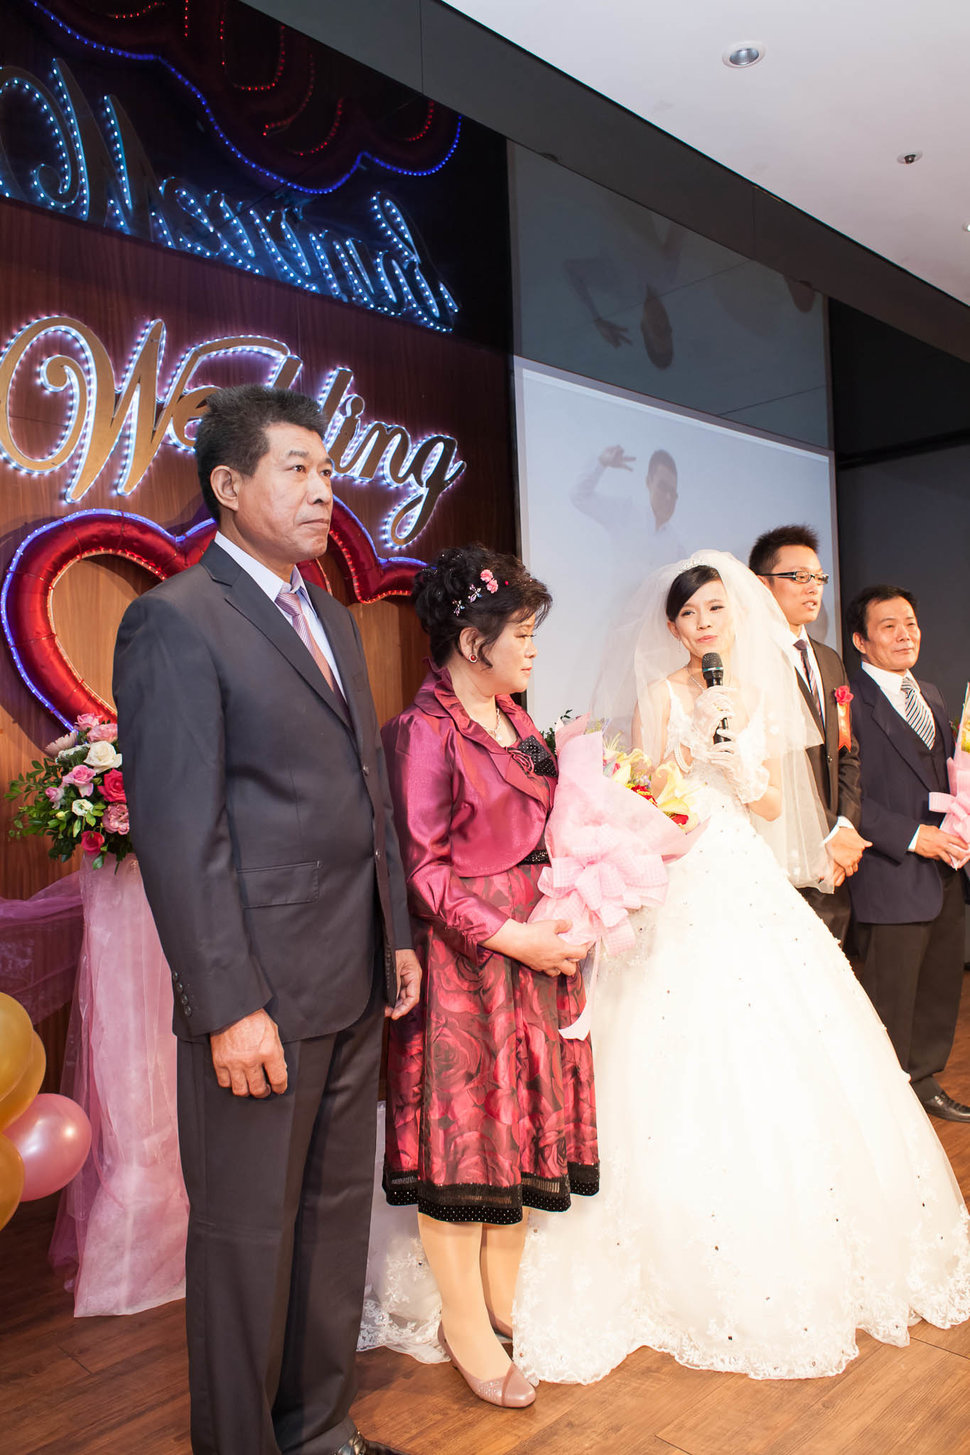 18PHOTO-青蛙王子娶新娘❤️(編號:218647) - 18PHOTO 婚紗影像攝影工作室 - 結婚吧